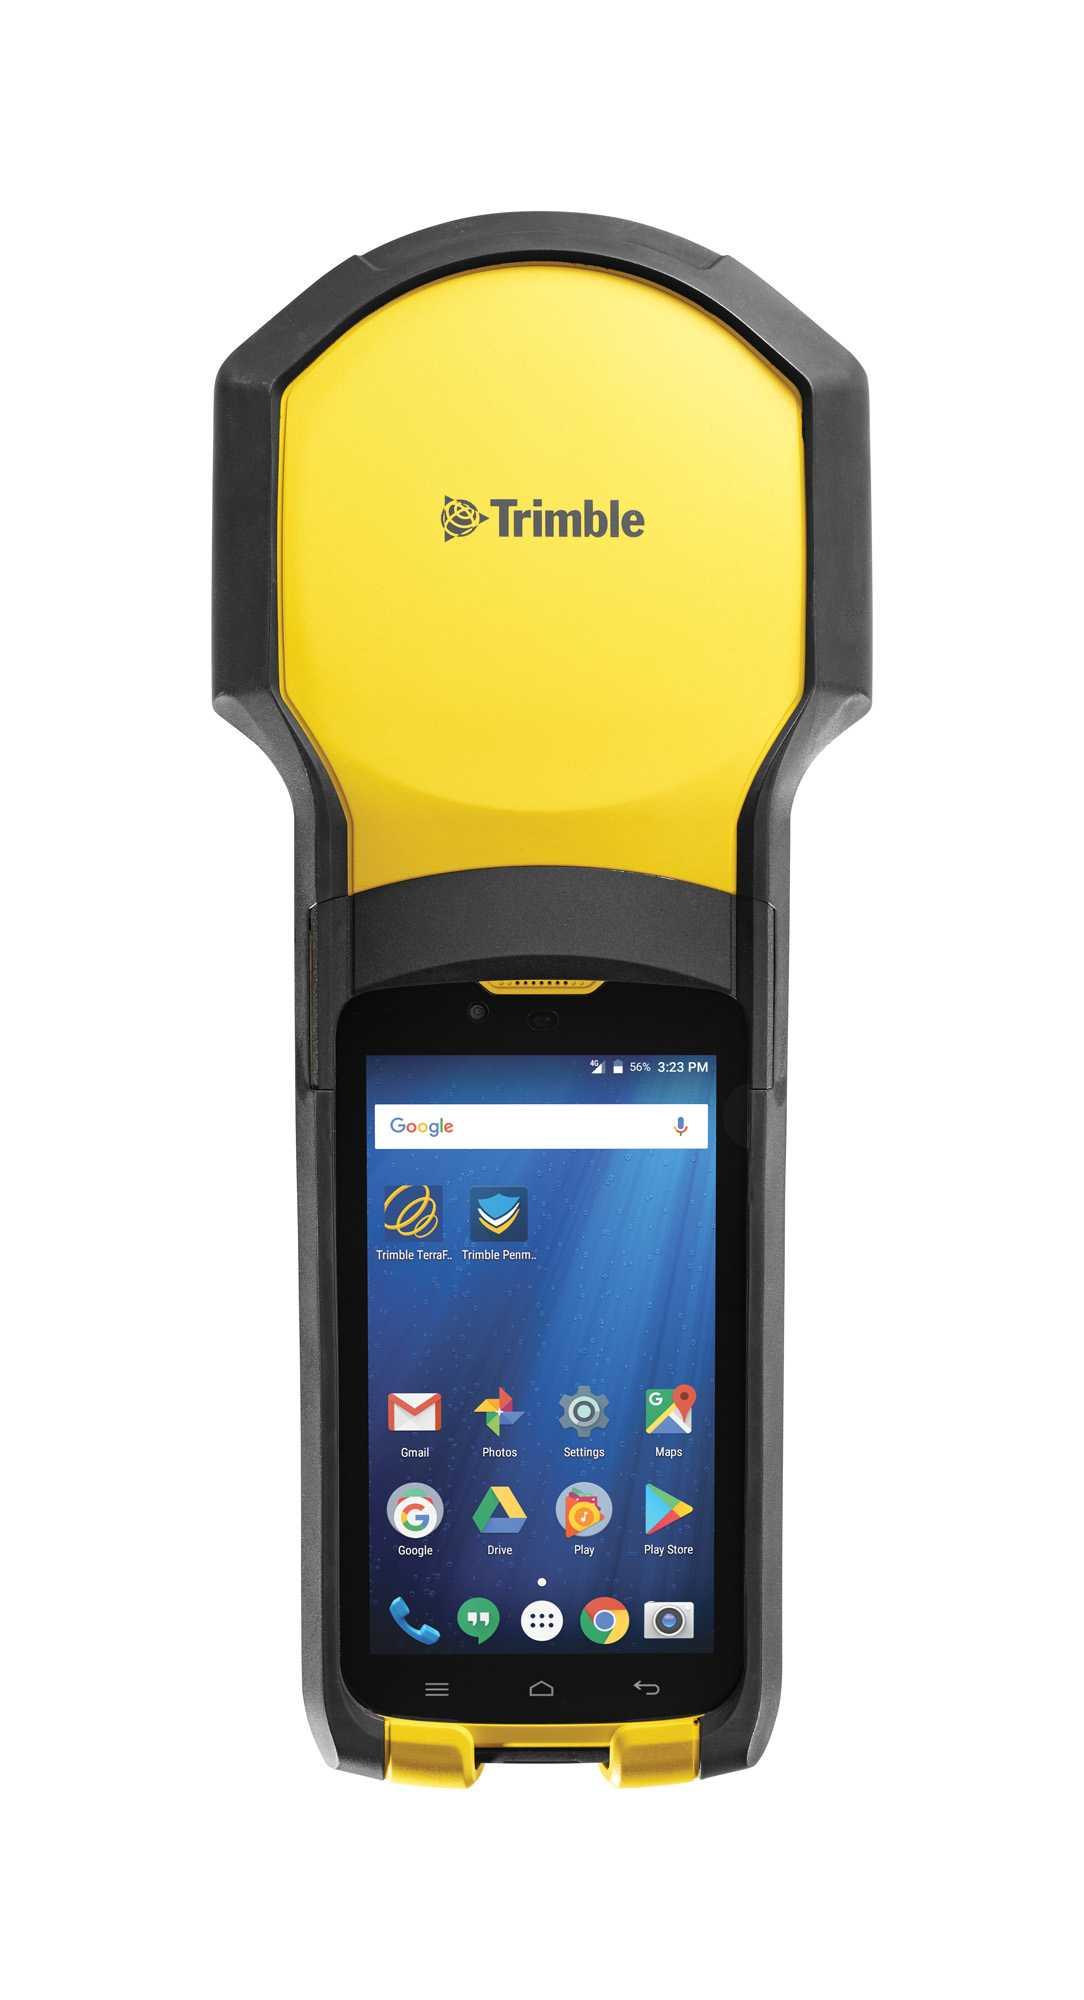 Trimble TDC150 Handheld Data Collector